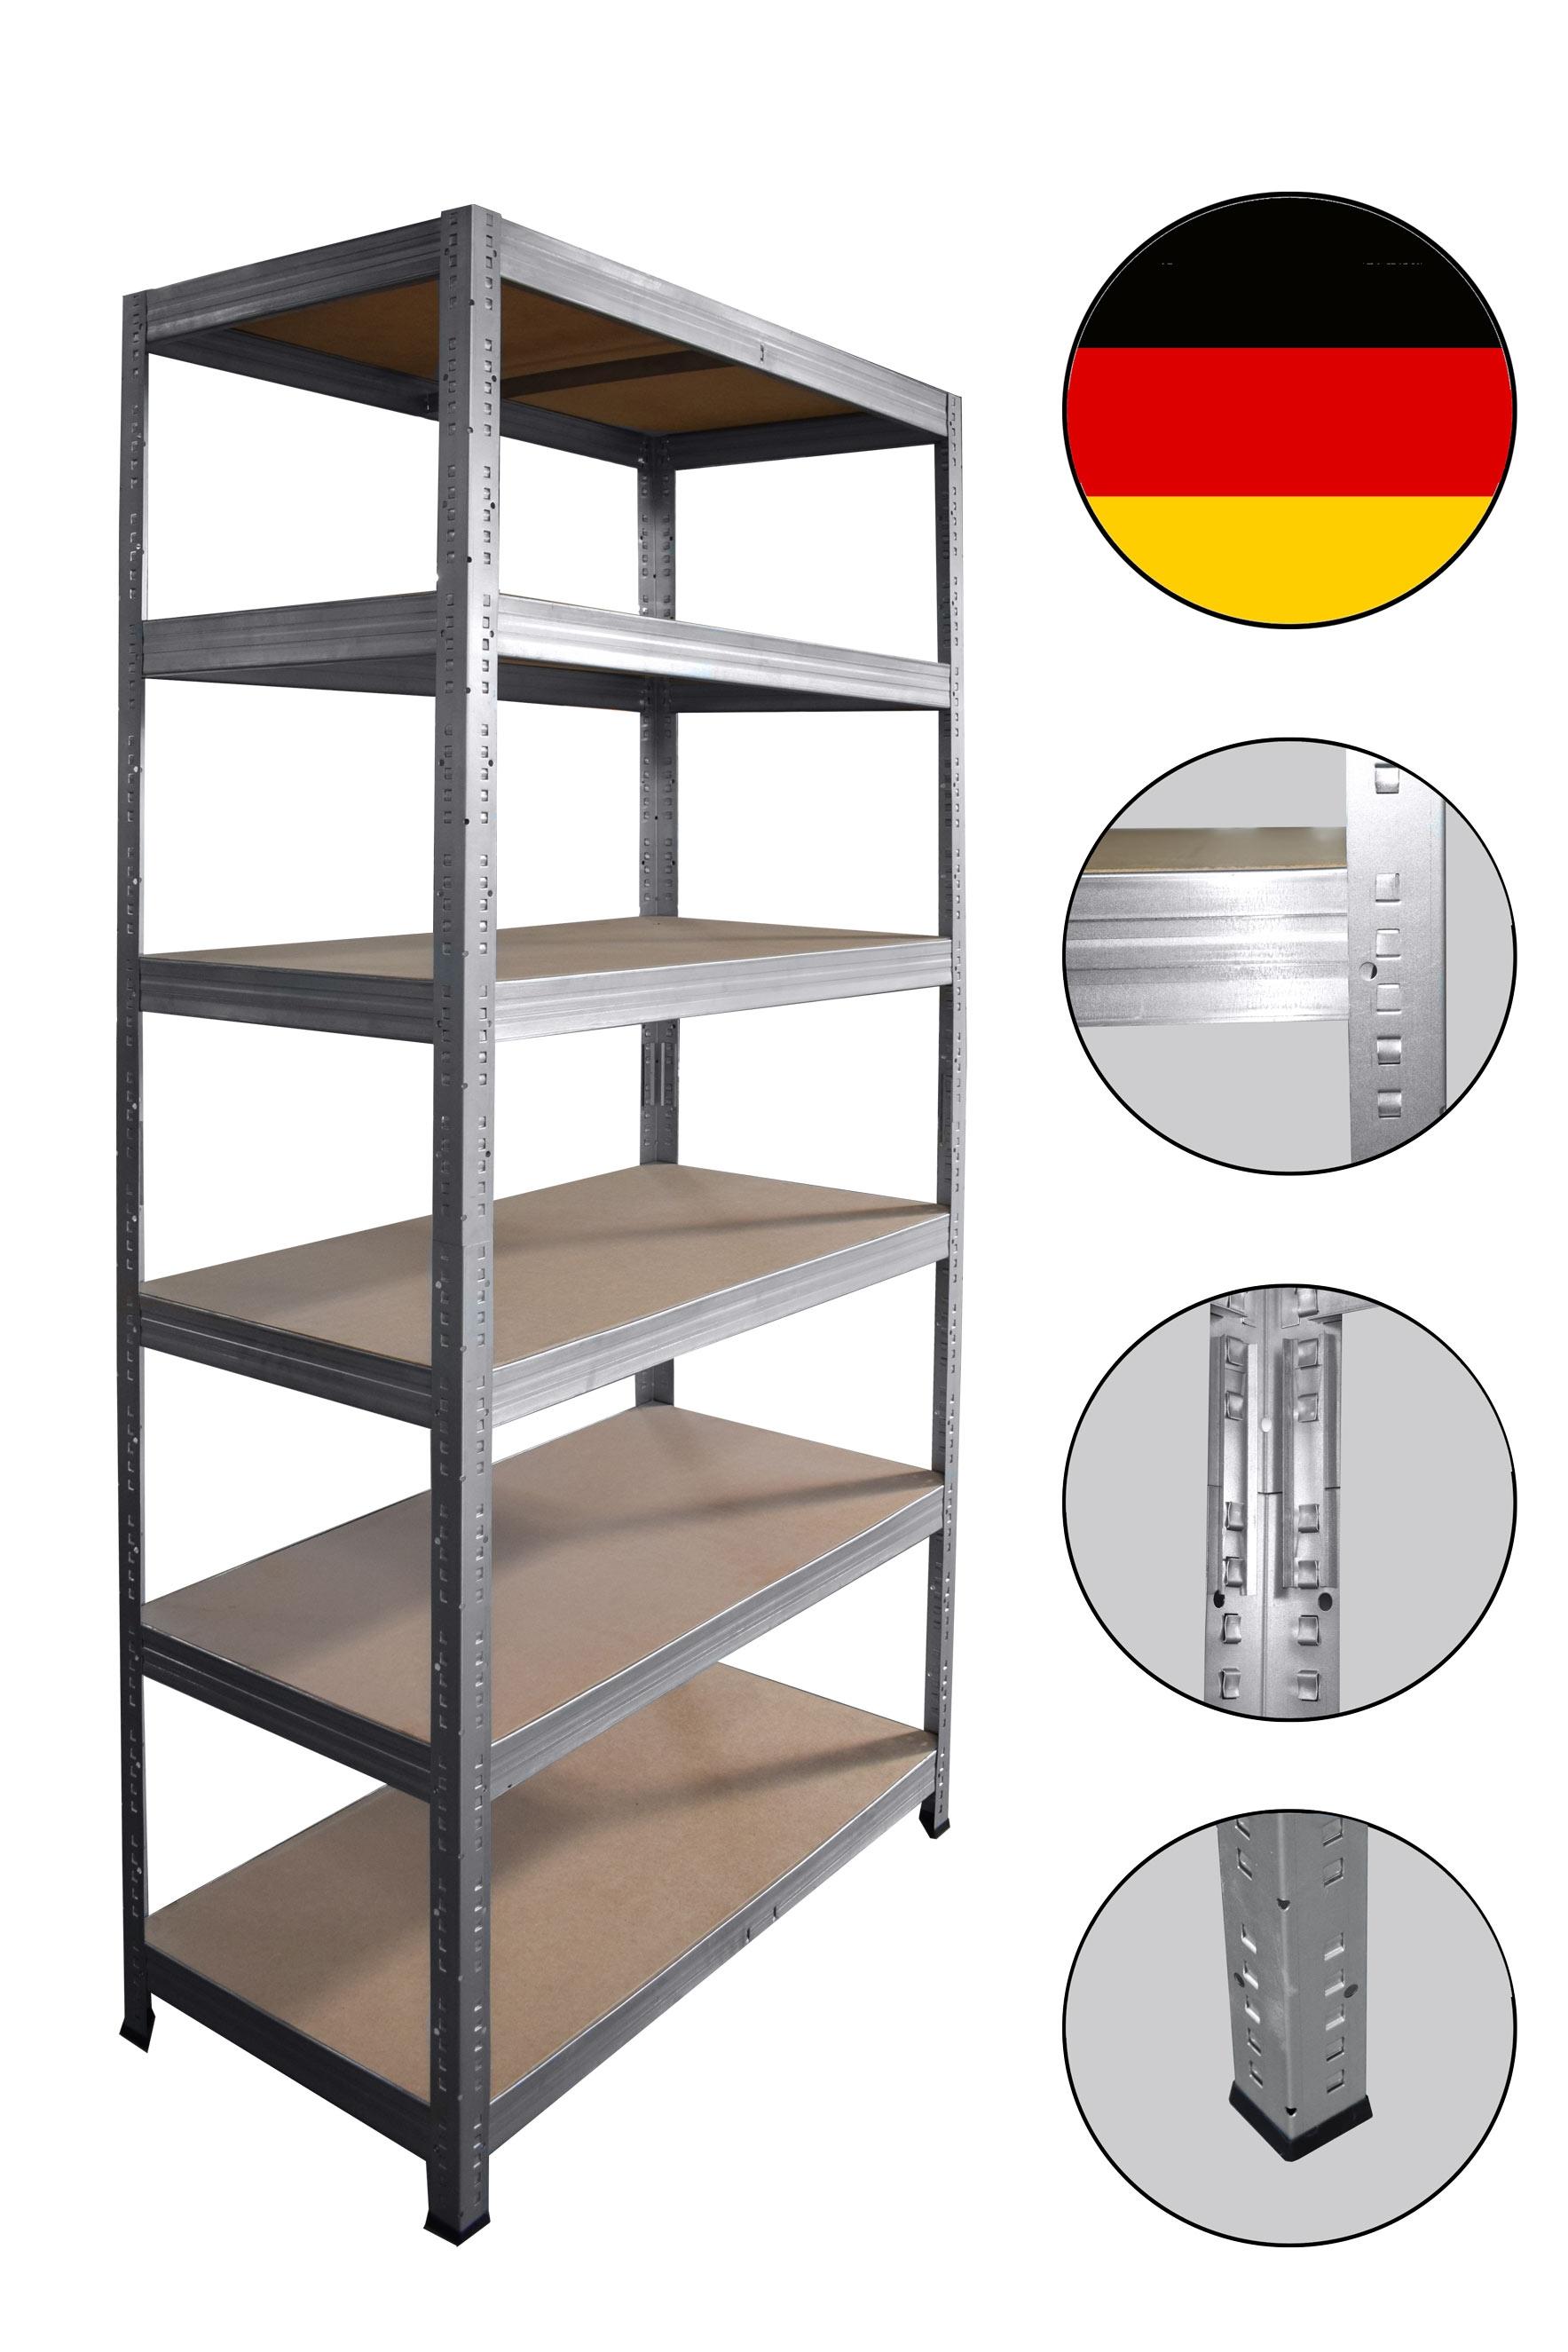 shelfplaza® PROFI Steckregal 200x75x40cm Akten Büro Garage Lager Werkstatt